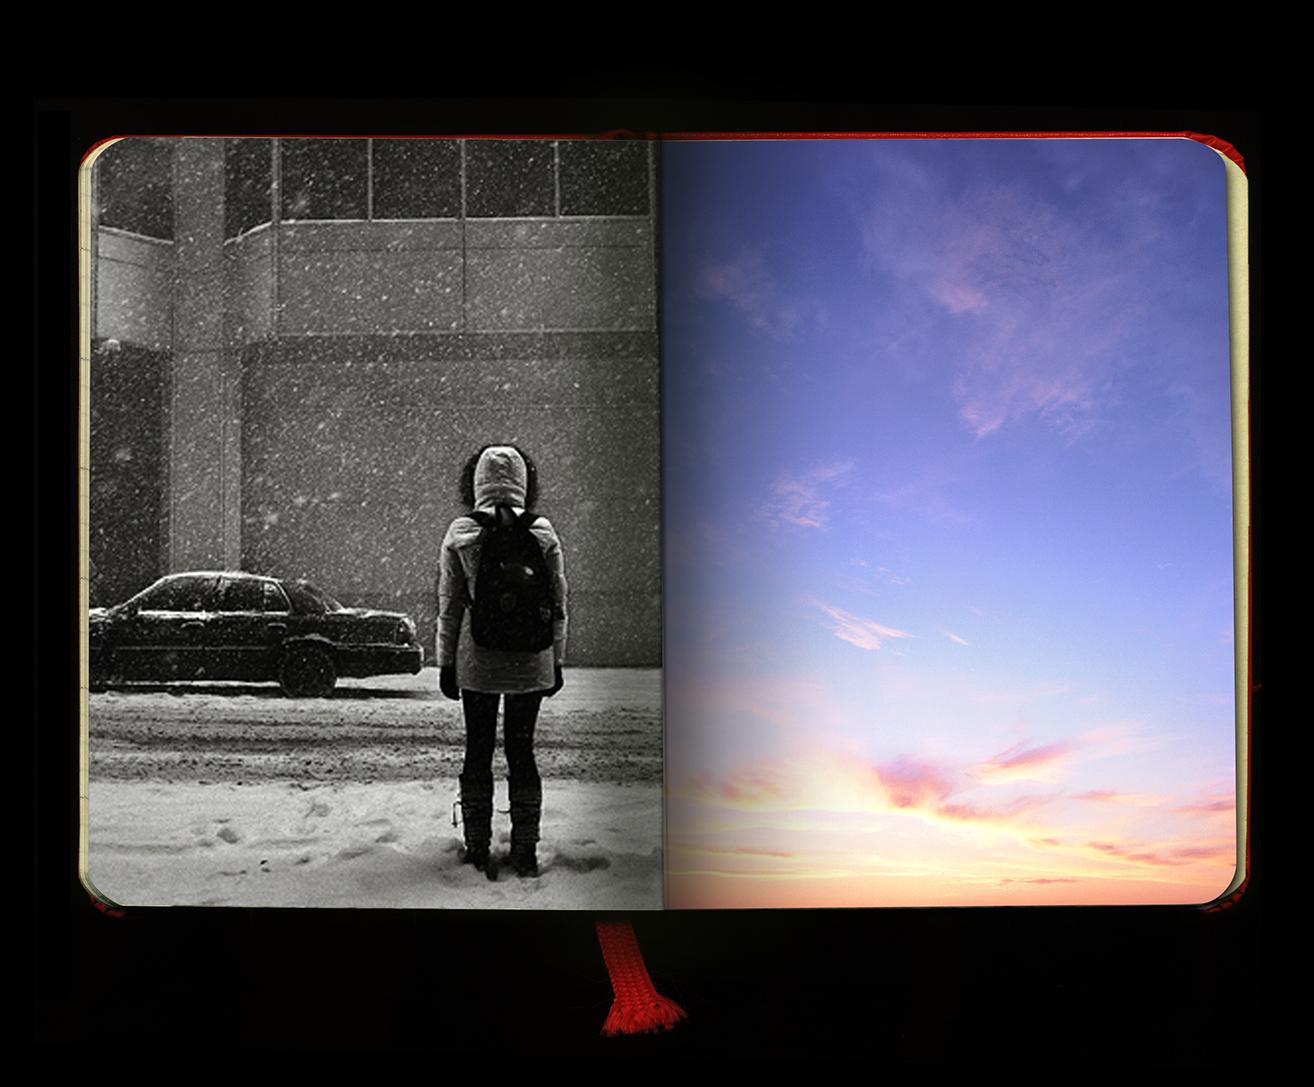 snowy_book_smaller.jpg